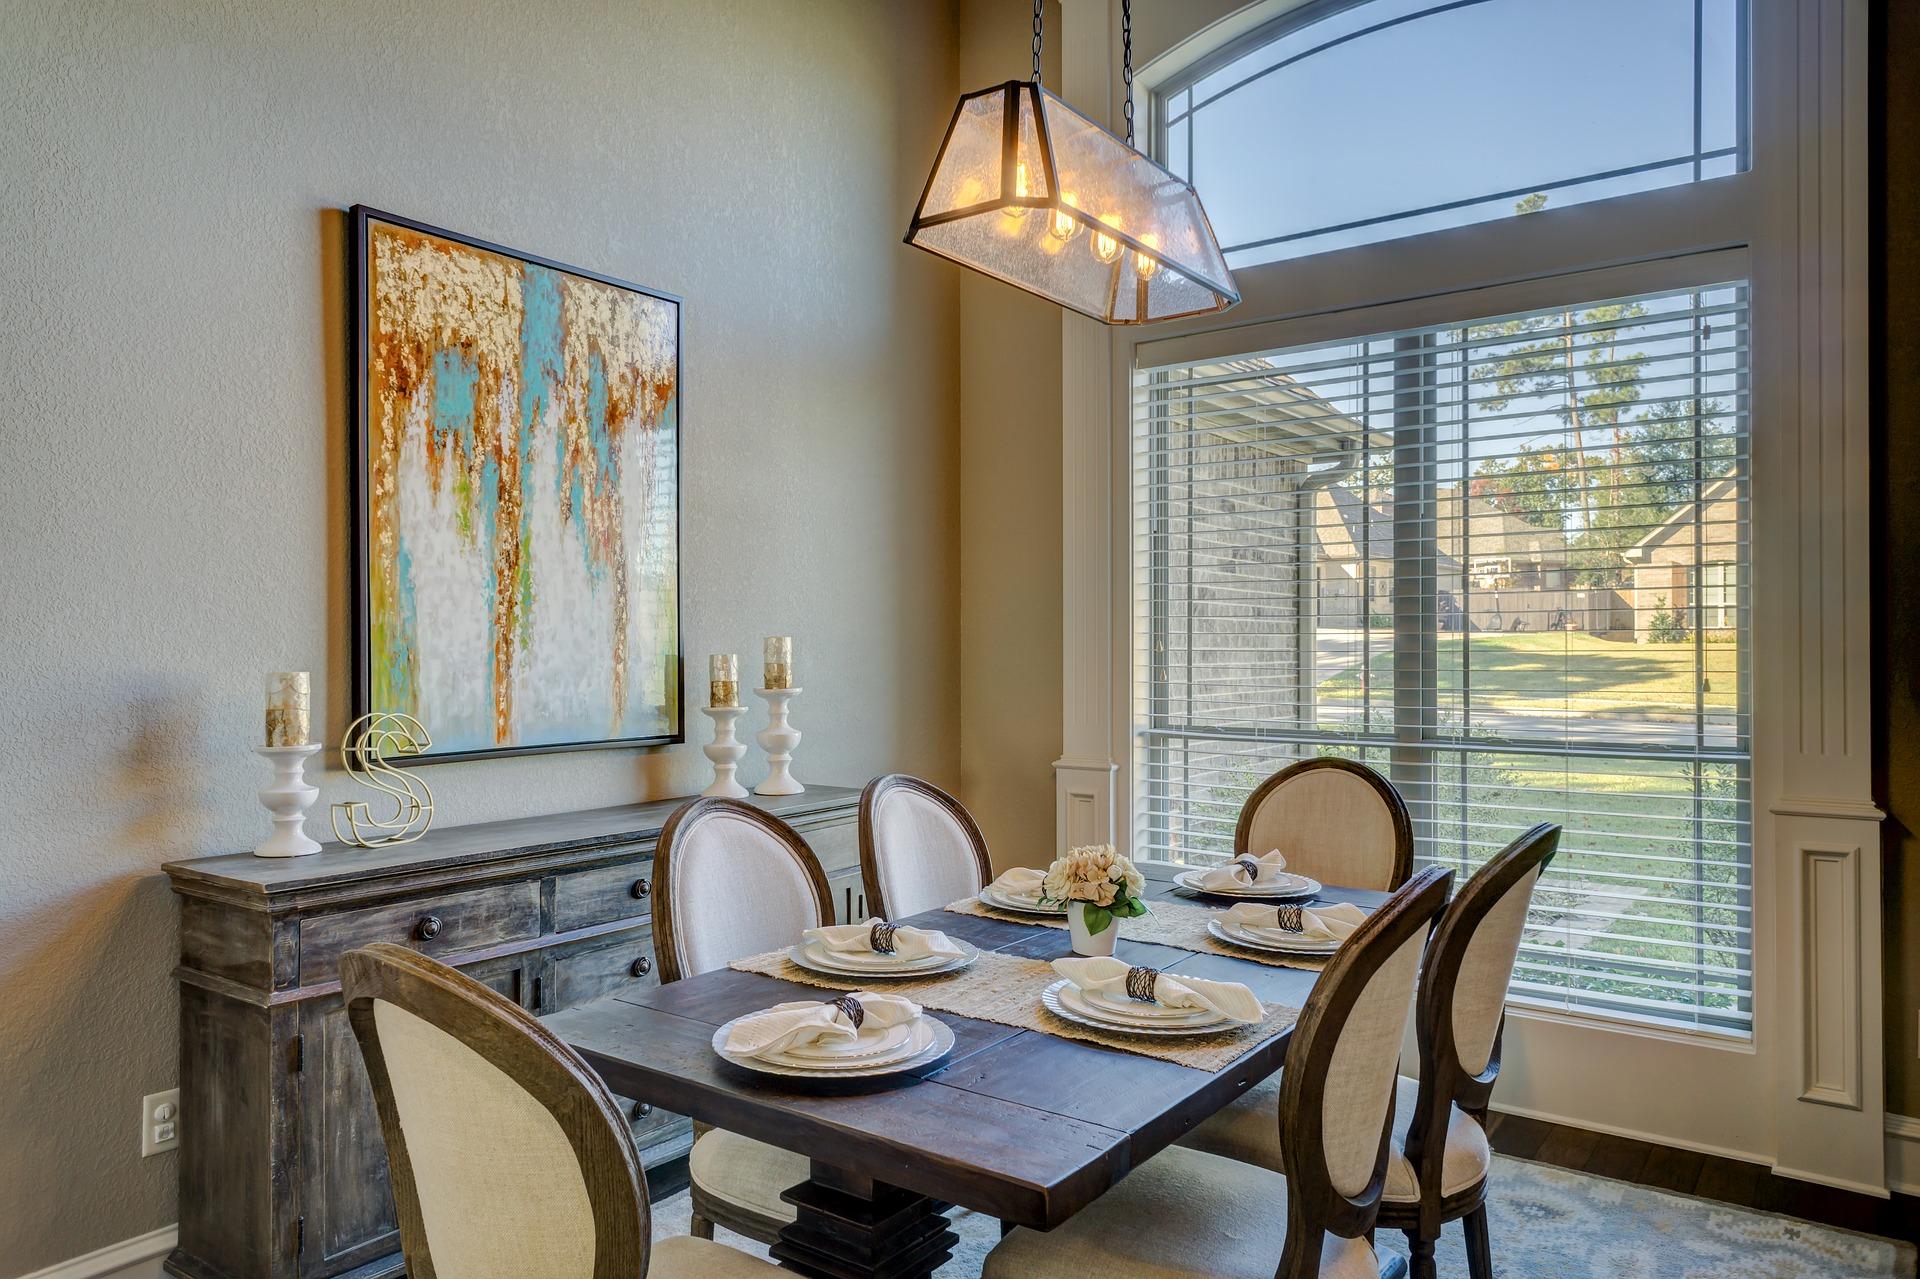 permassure select livingroom solutions verticalselect header blinds vertical